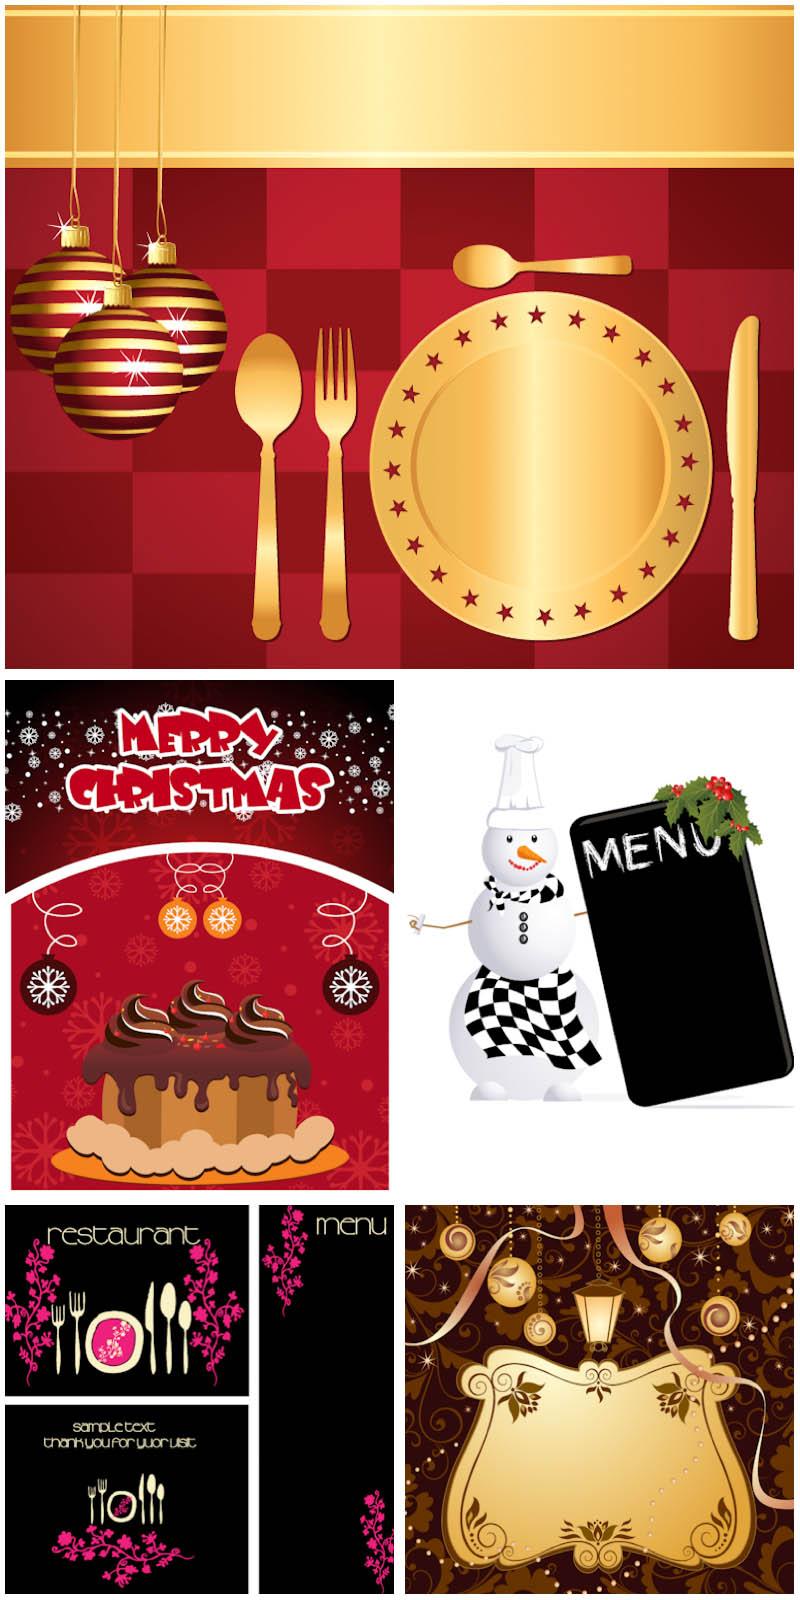 11 Free Restaurant Menu Vector Graphics Images